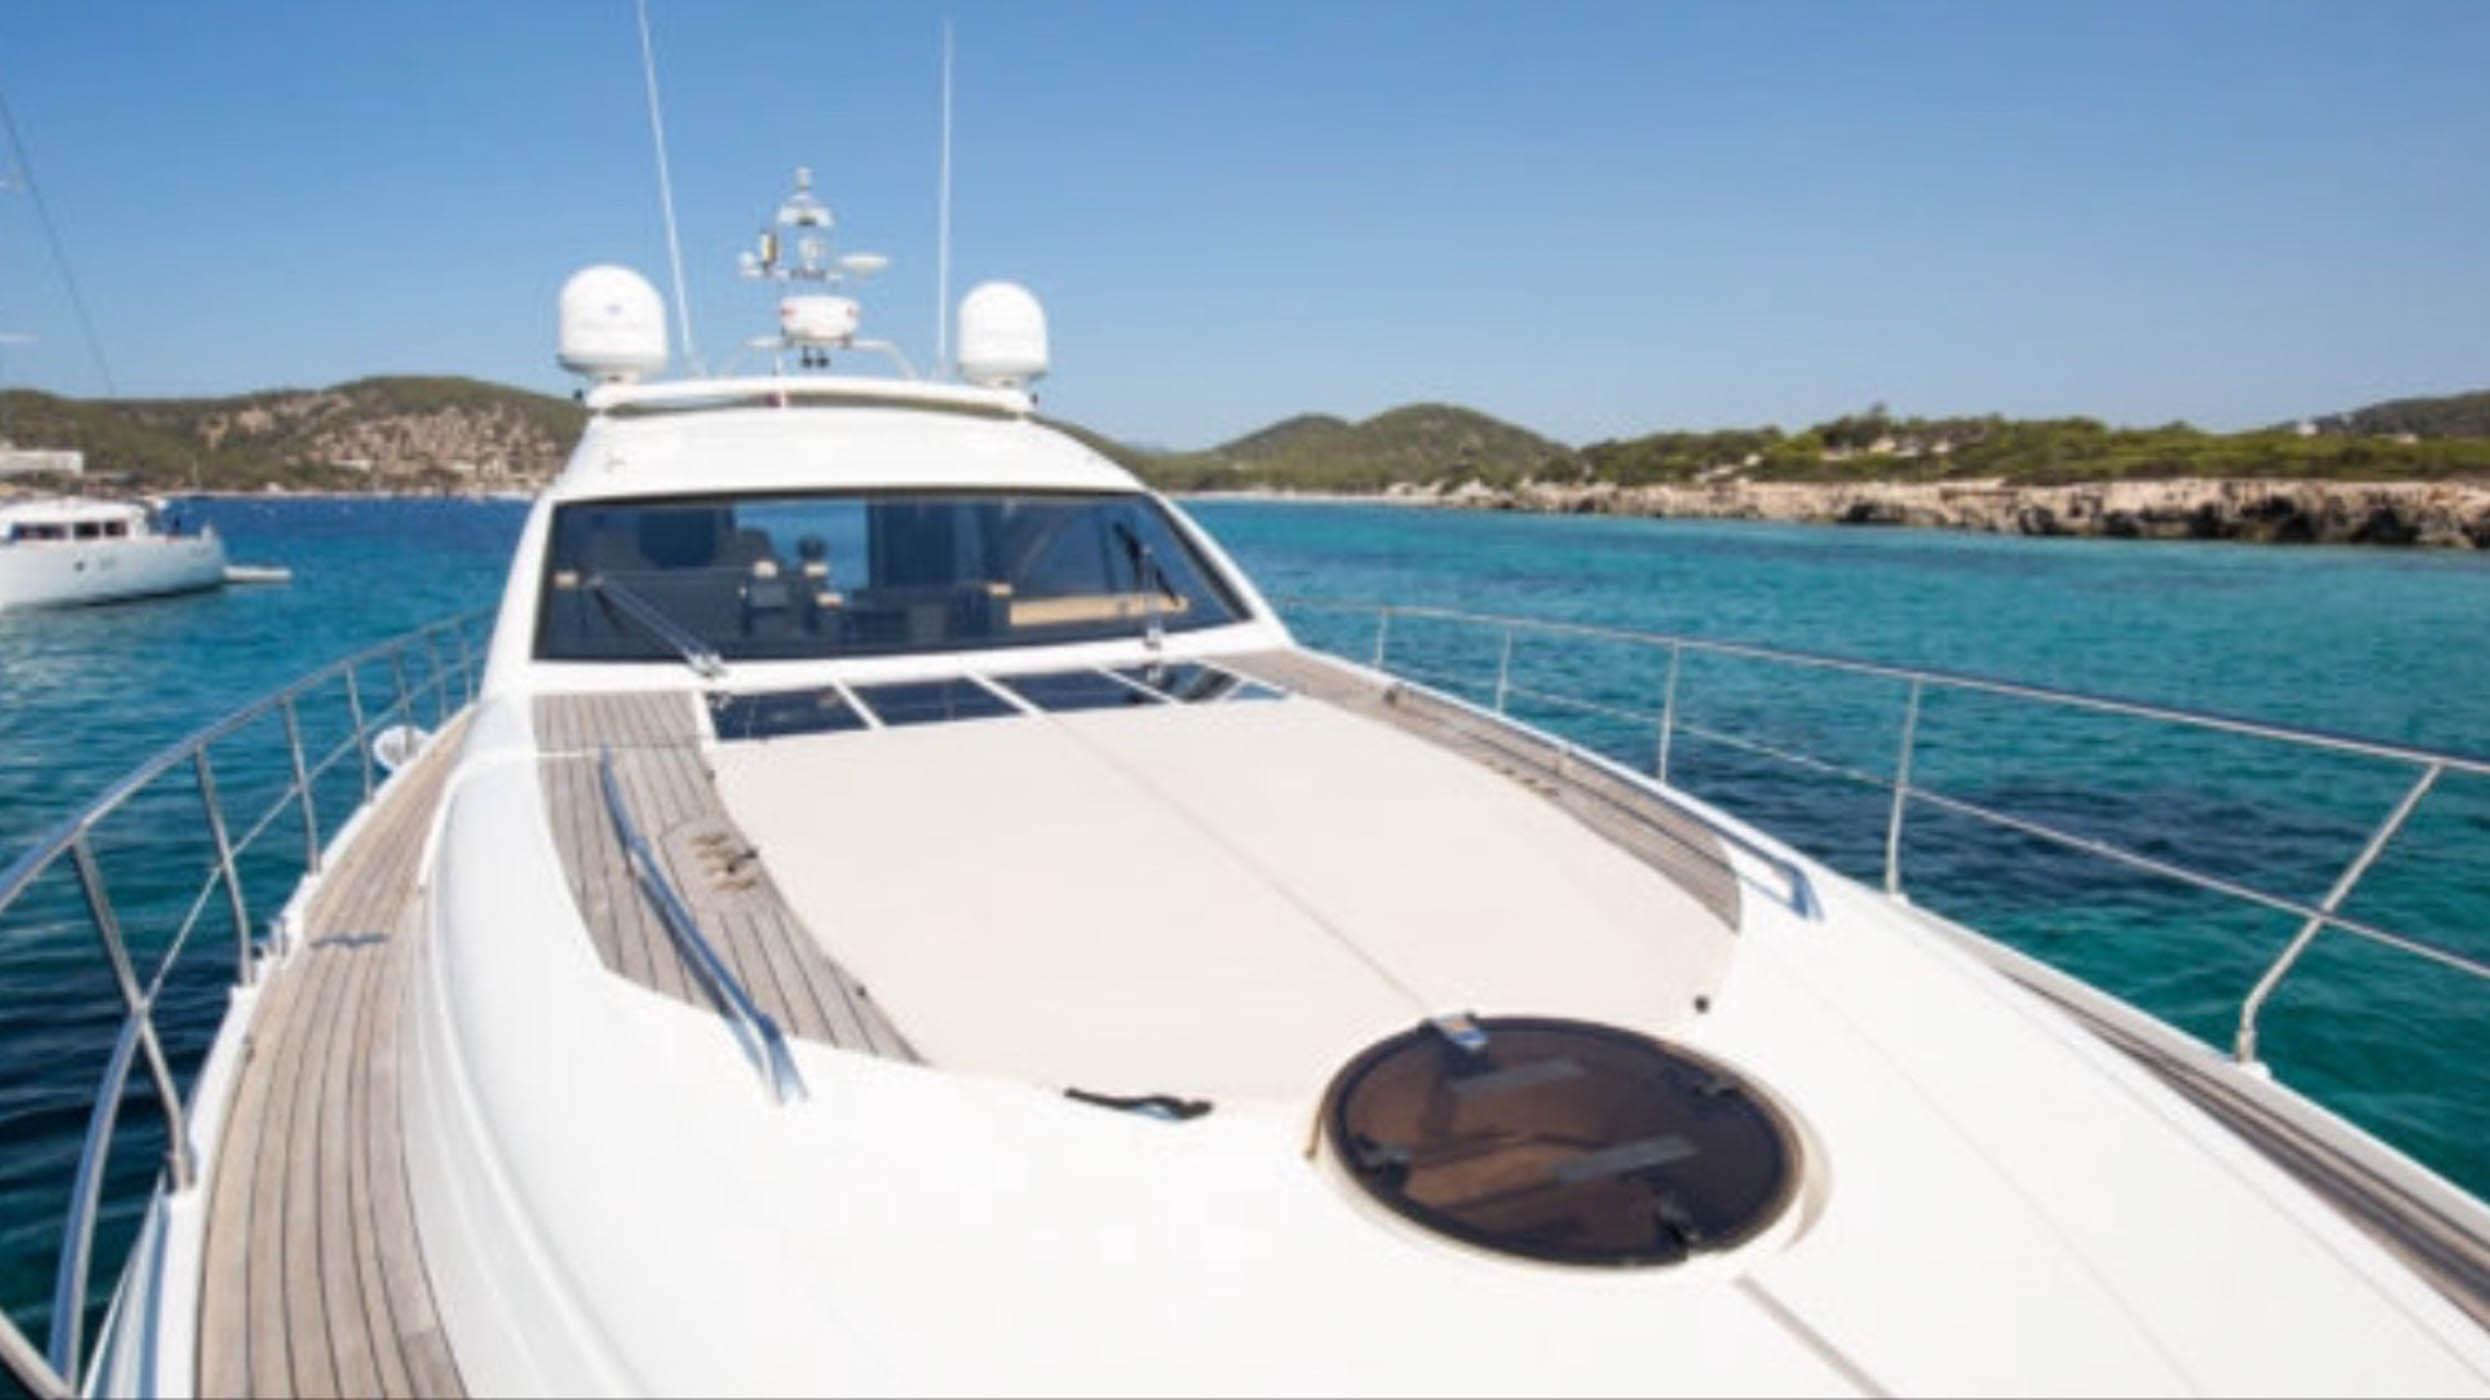 Aura-Ibiza-Boats-2018-007.jpg